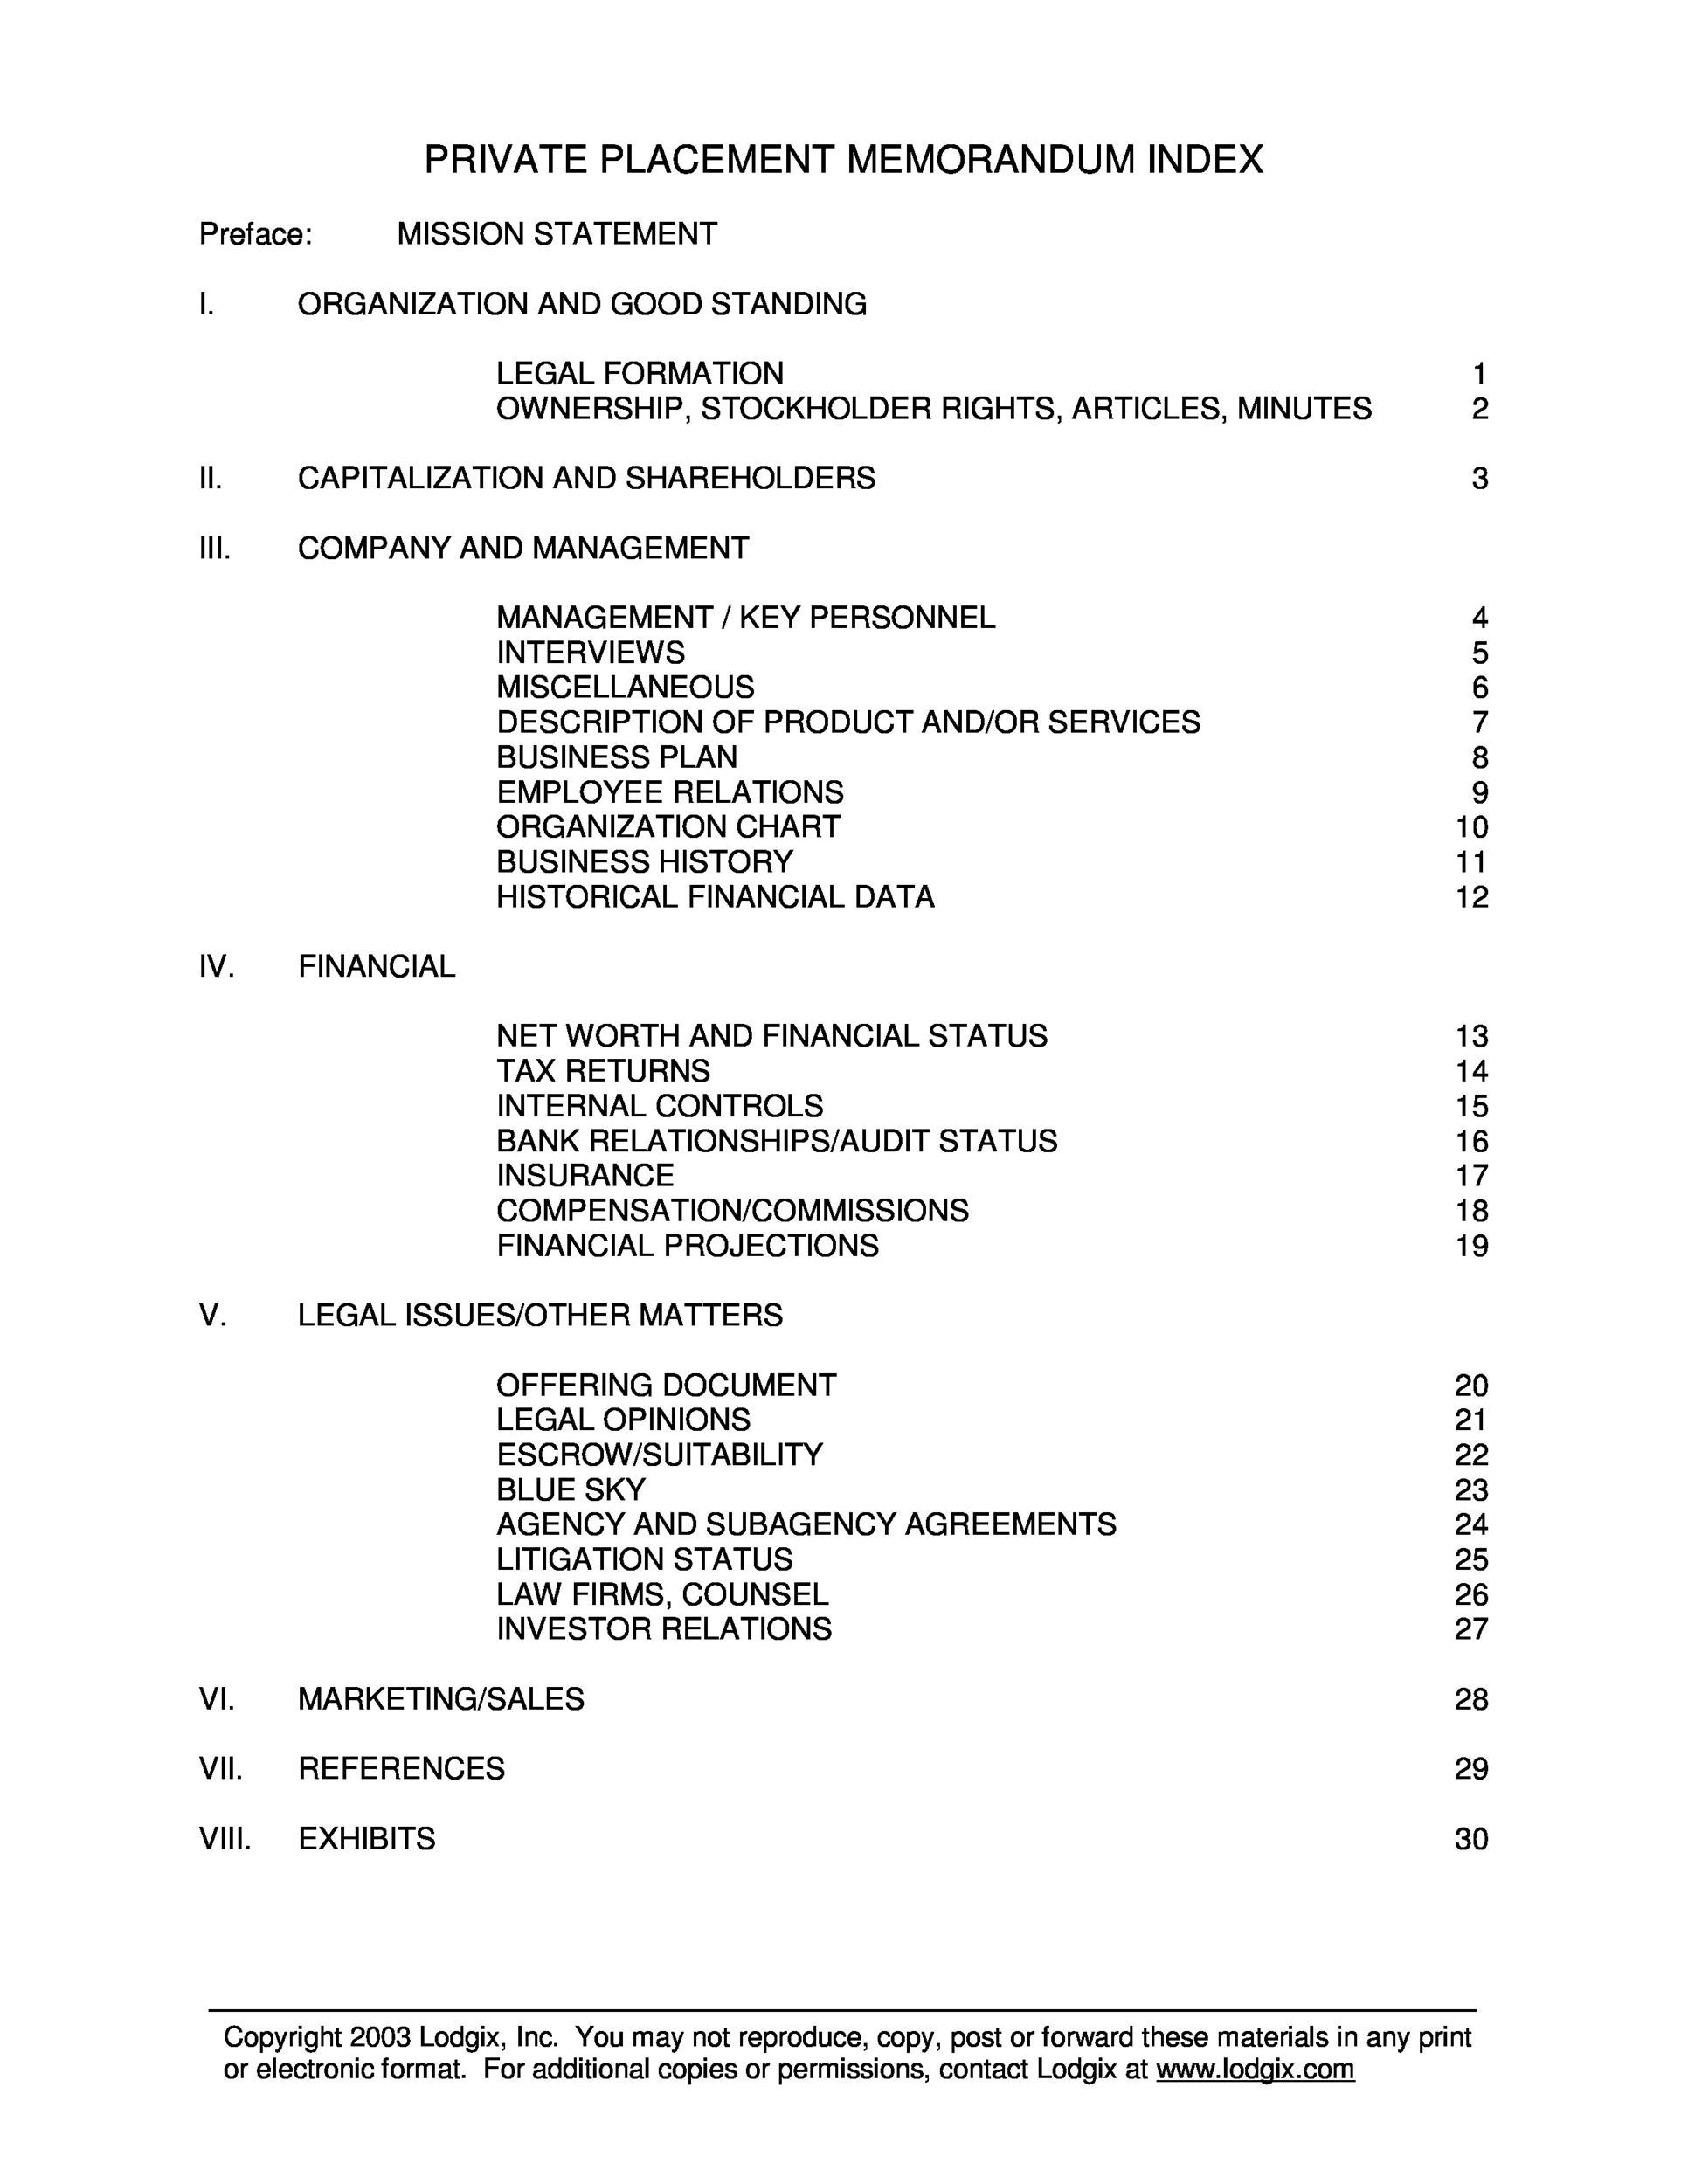 Free private placement memorandum template 39